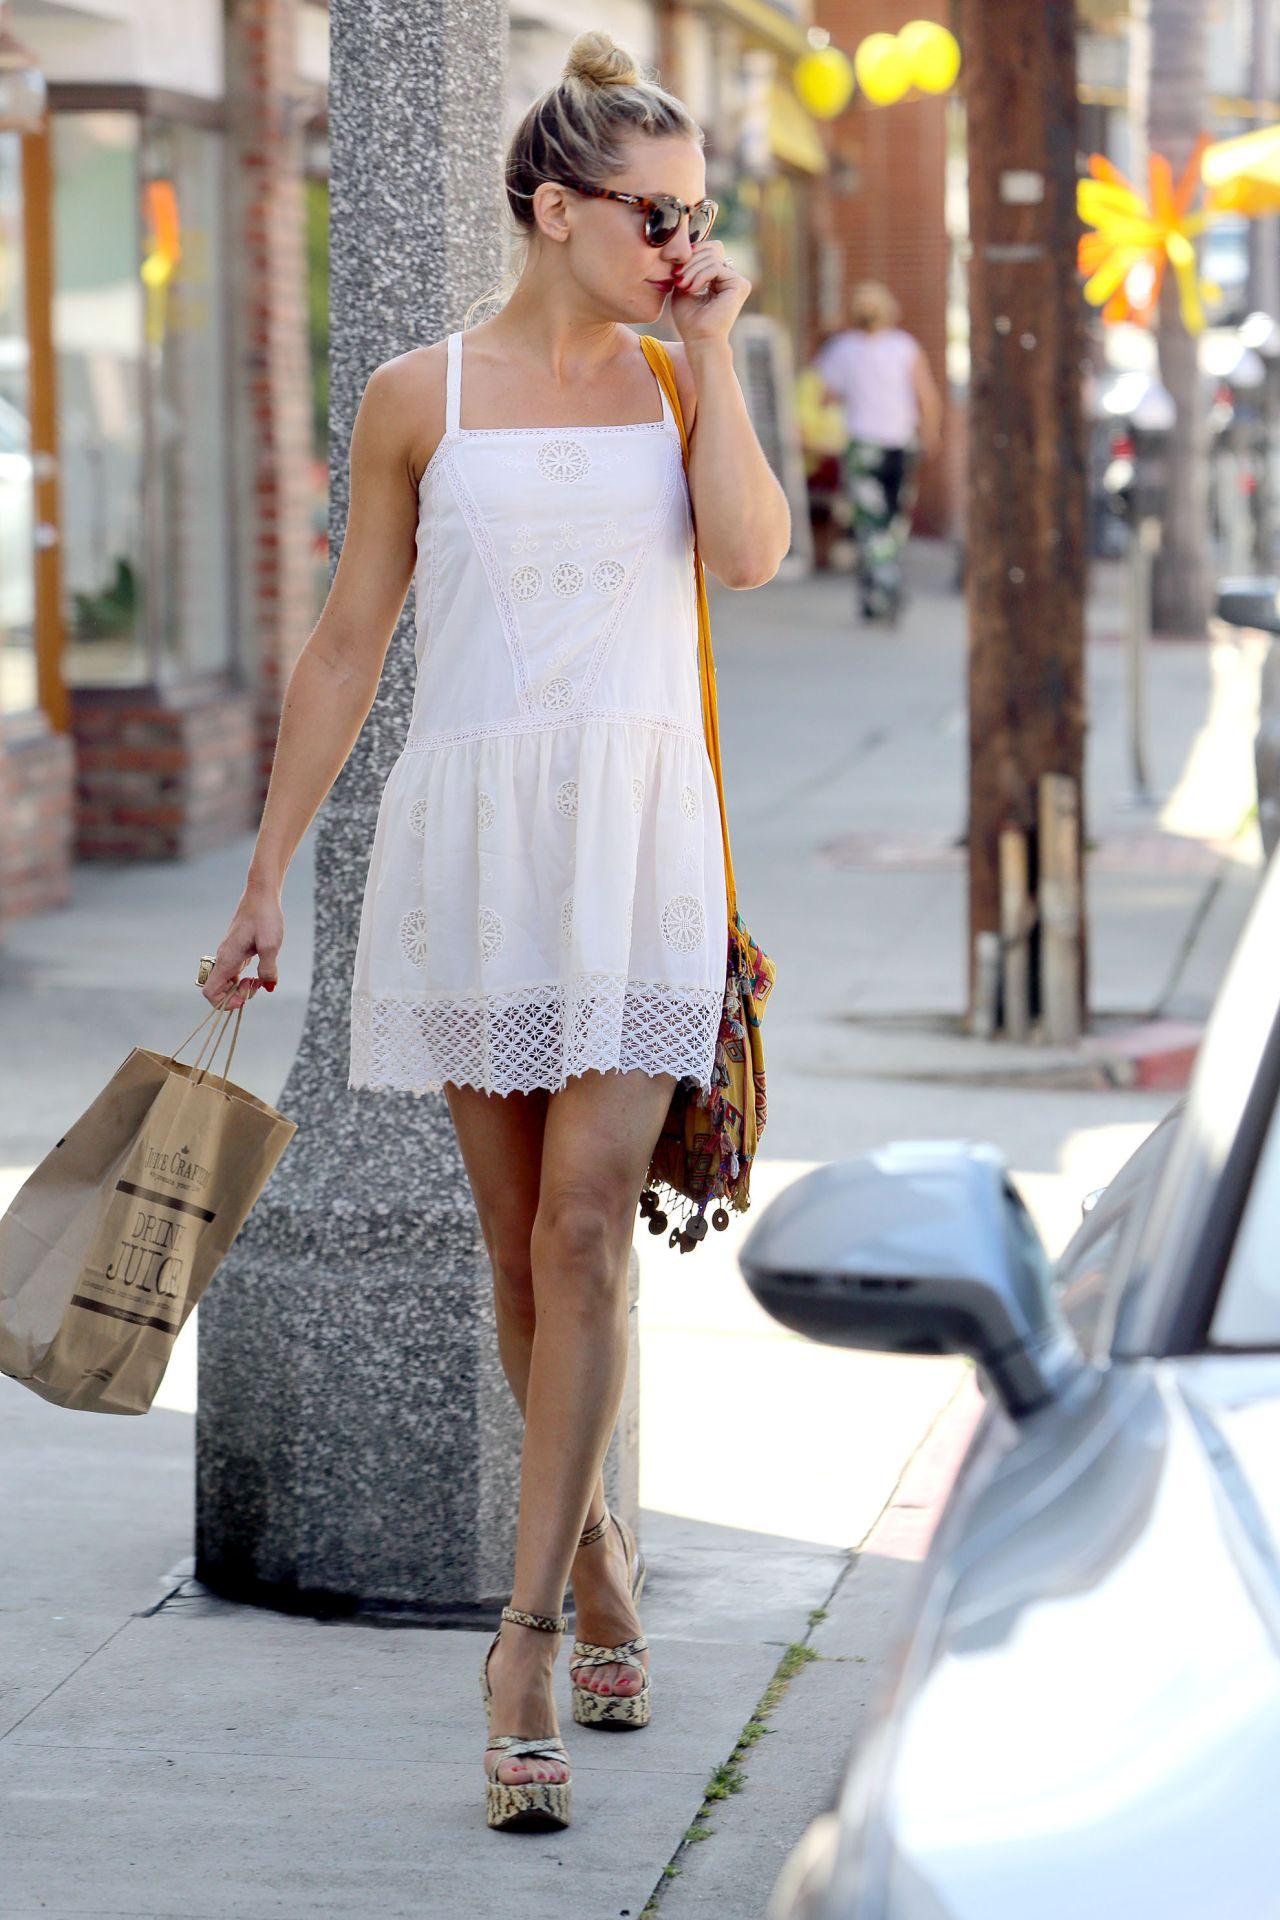 Kate Hudson Leggy Shopping In Los Angeles April 2015